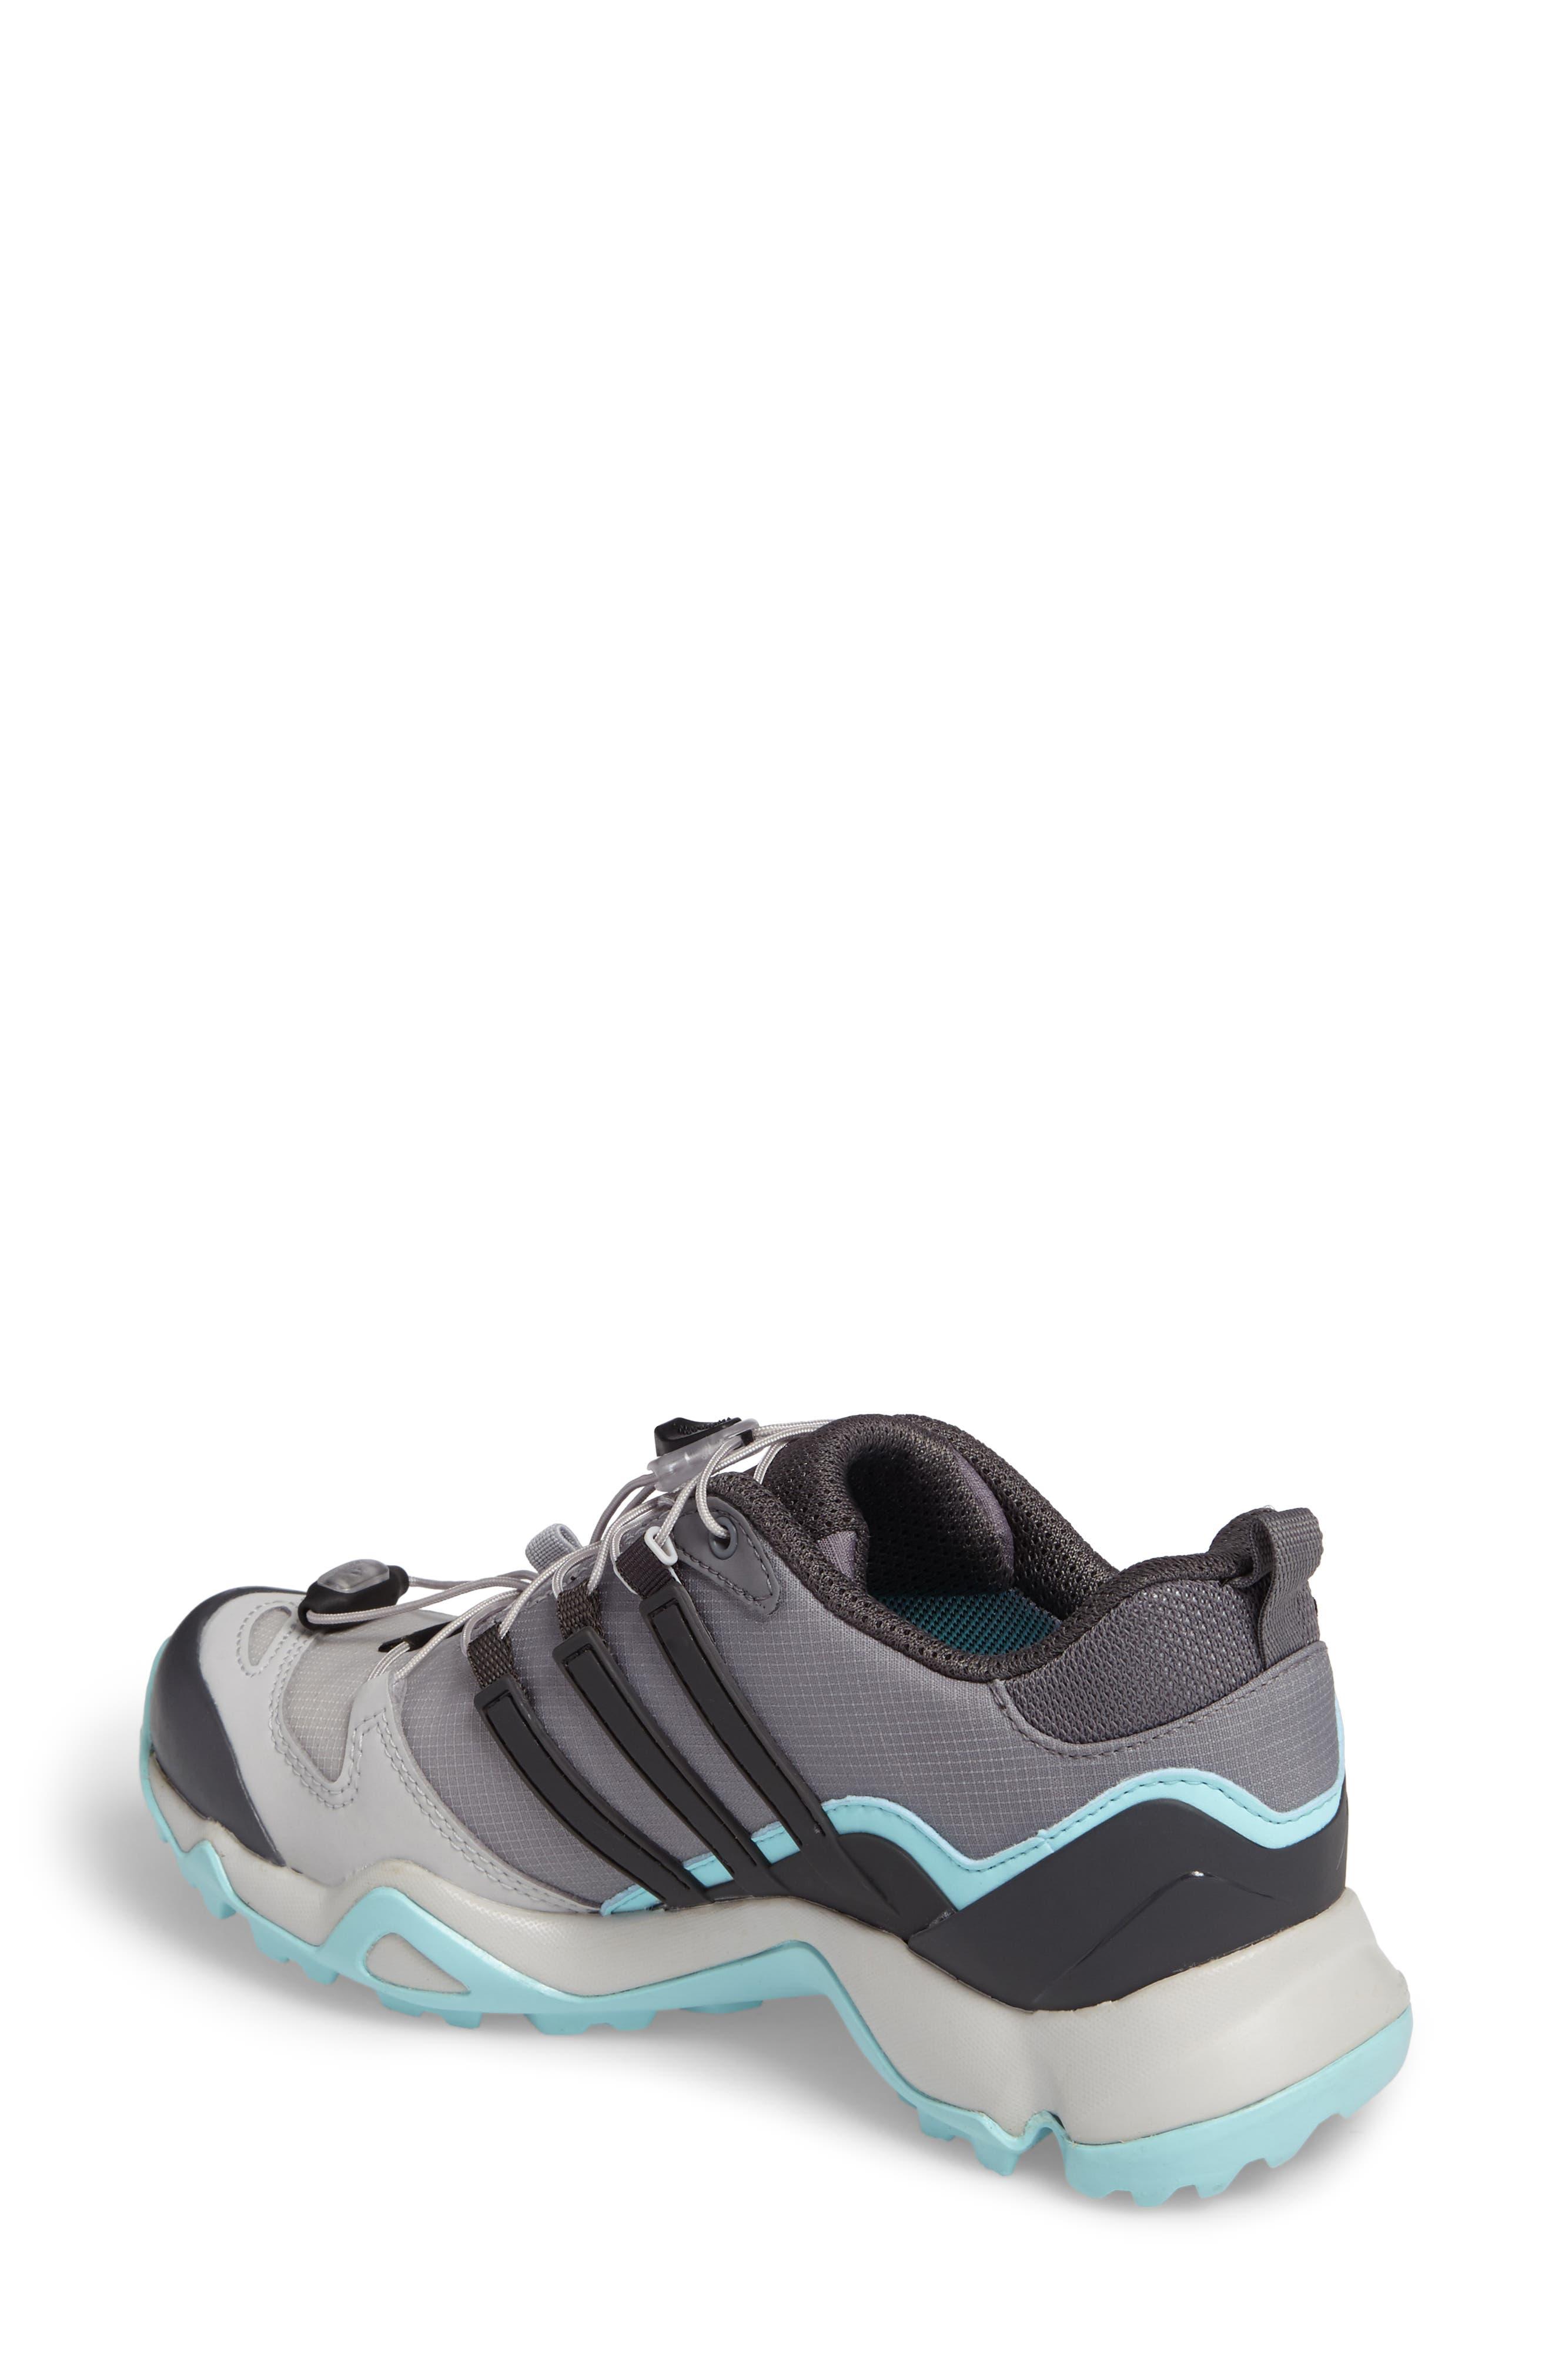 Terrex Swift R GTX Hiking Shoe,                             Alternate thumbnail 2, color,                             020